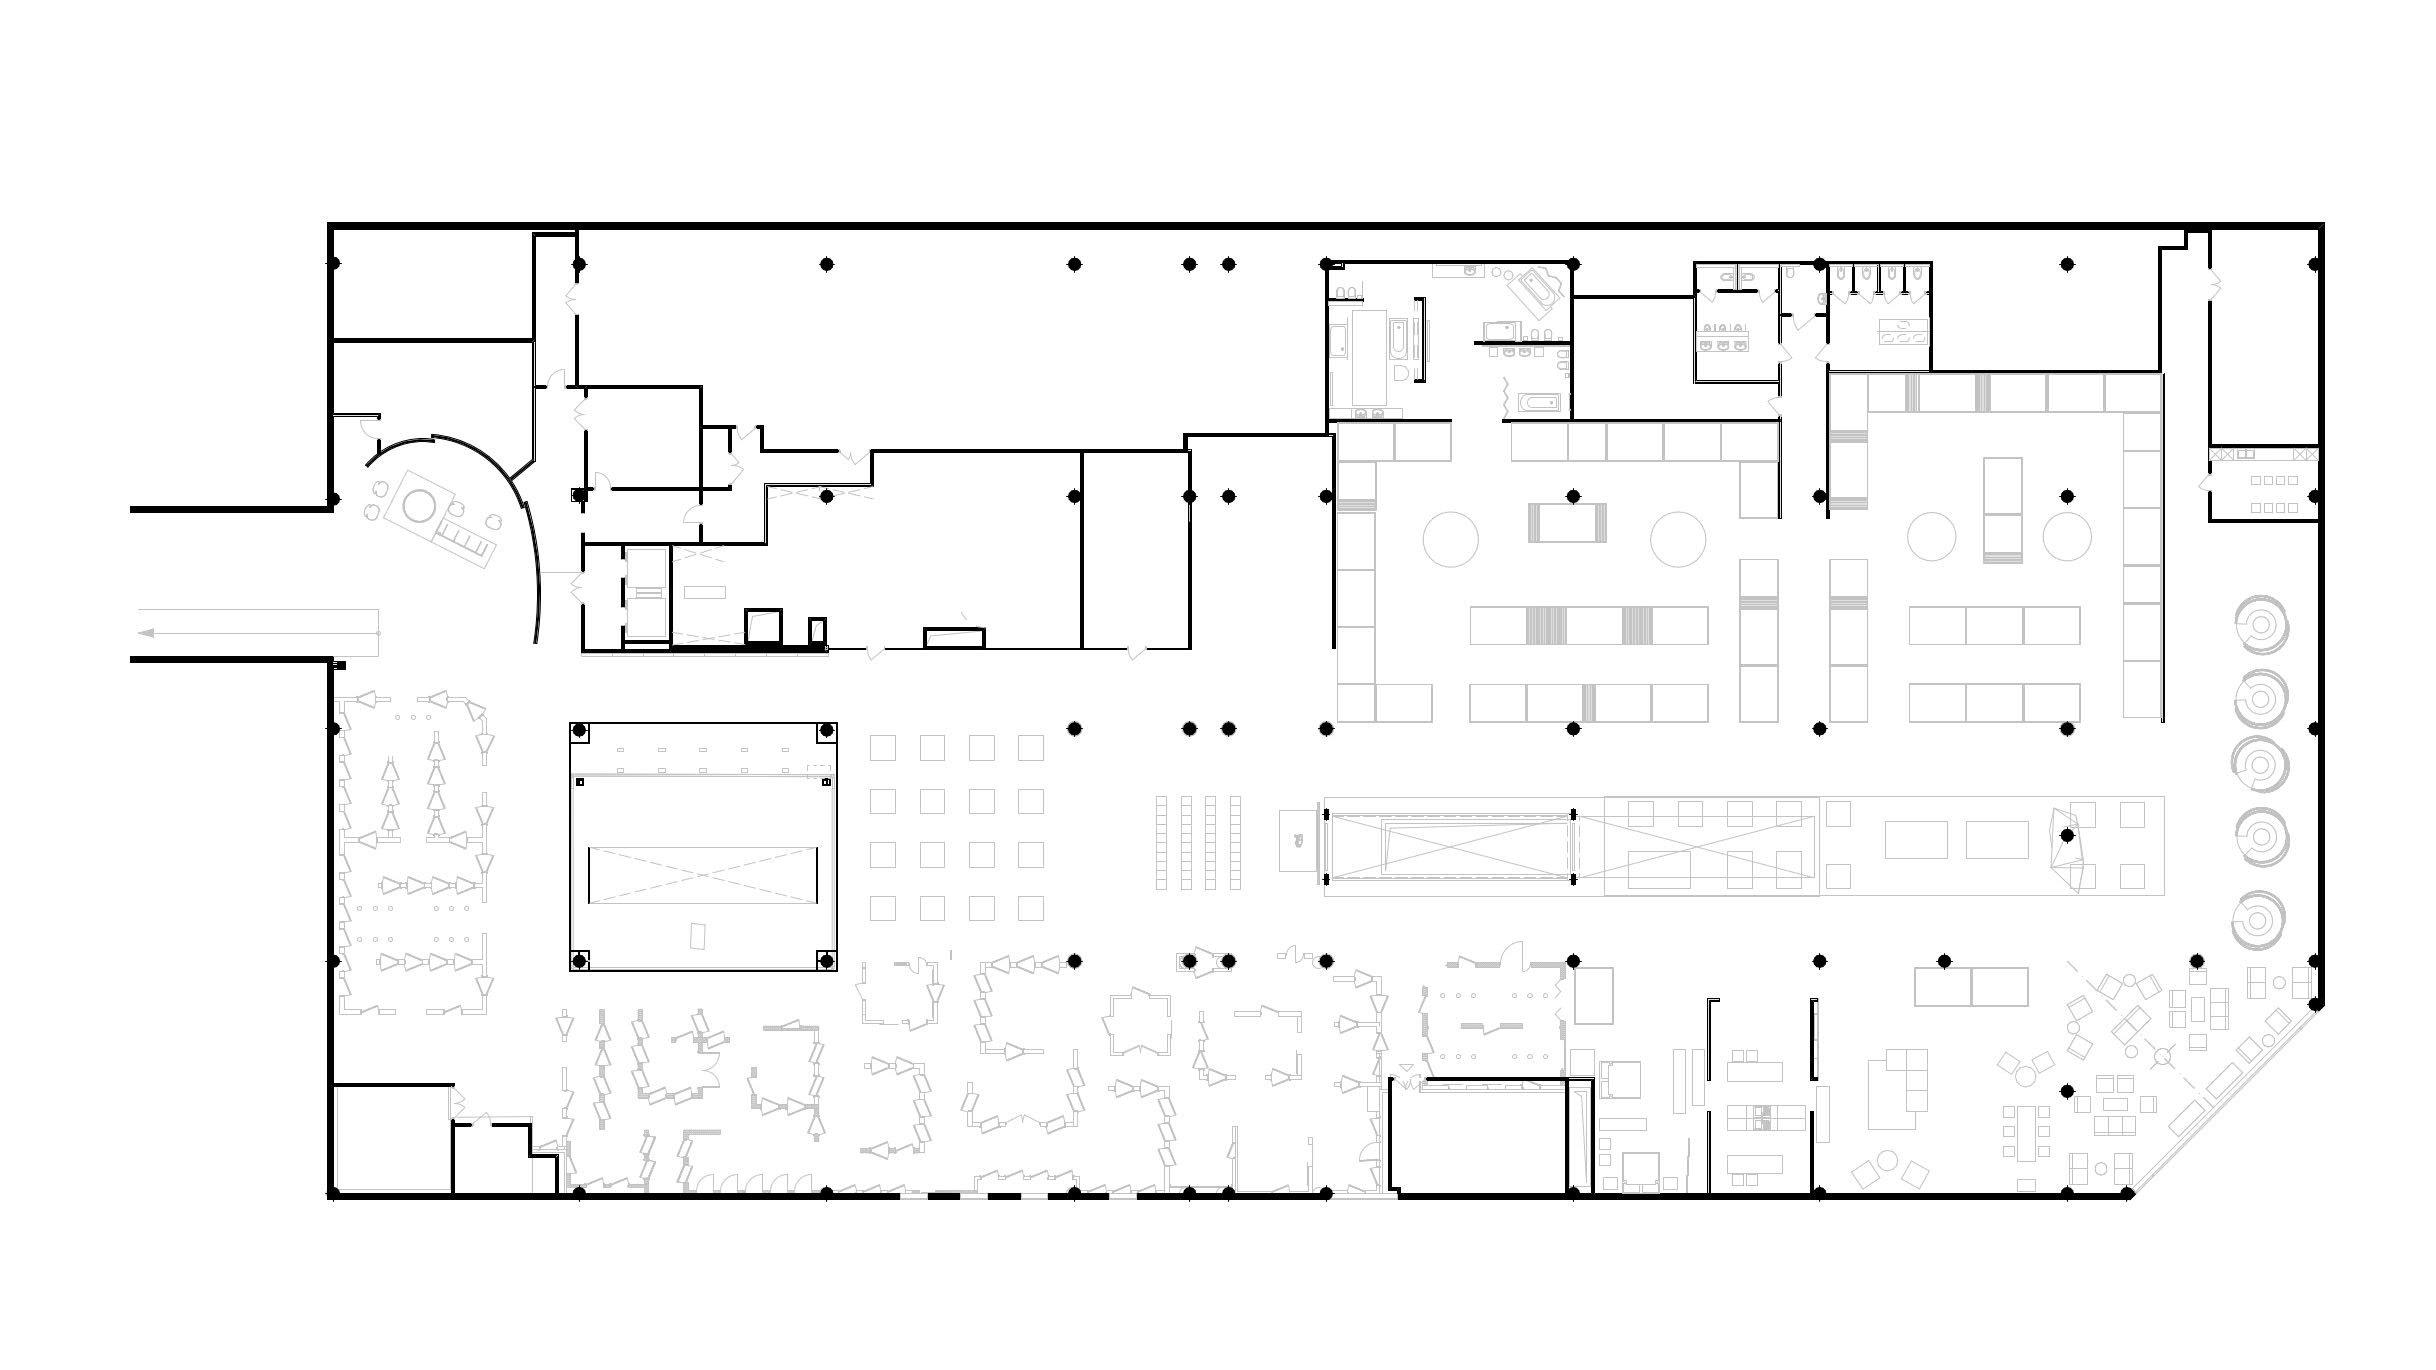 image-1-0: epicentr_bandery-interior